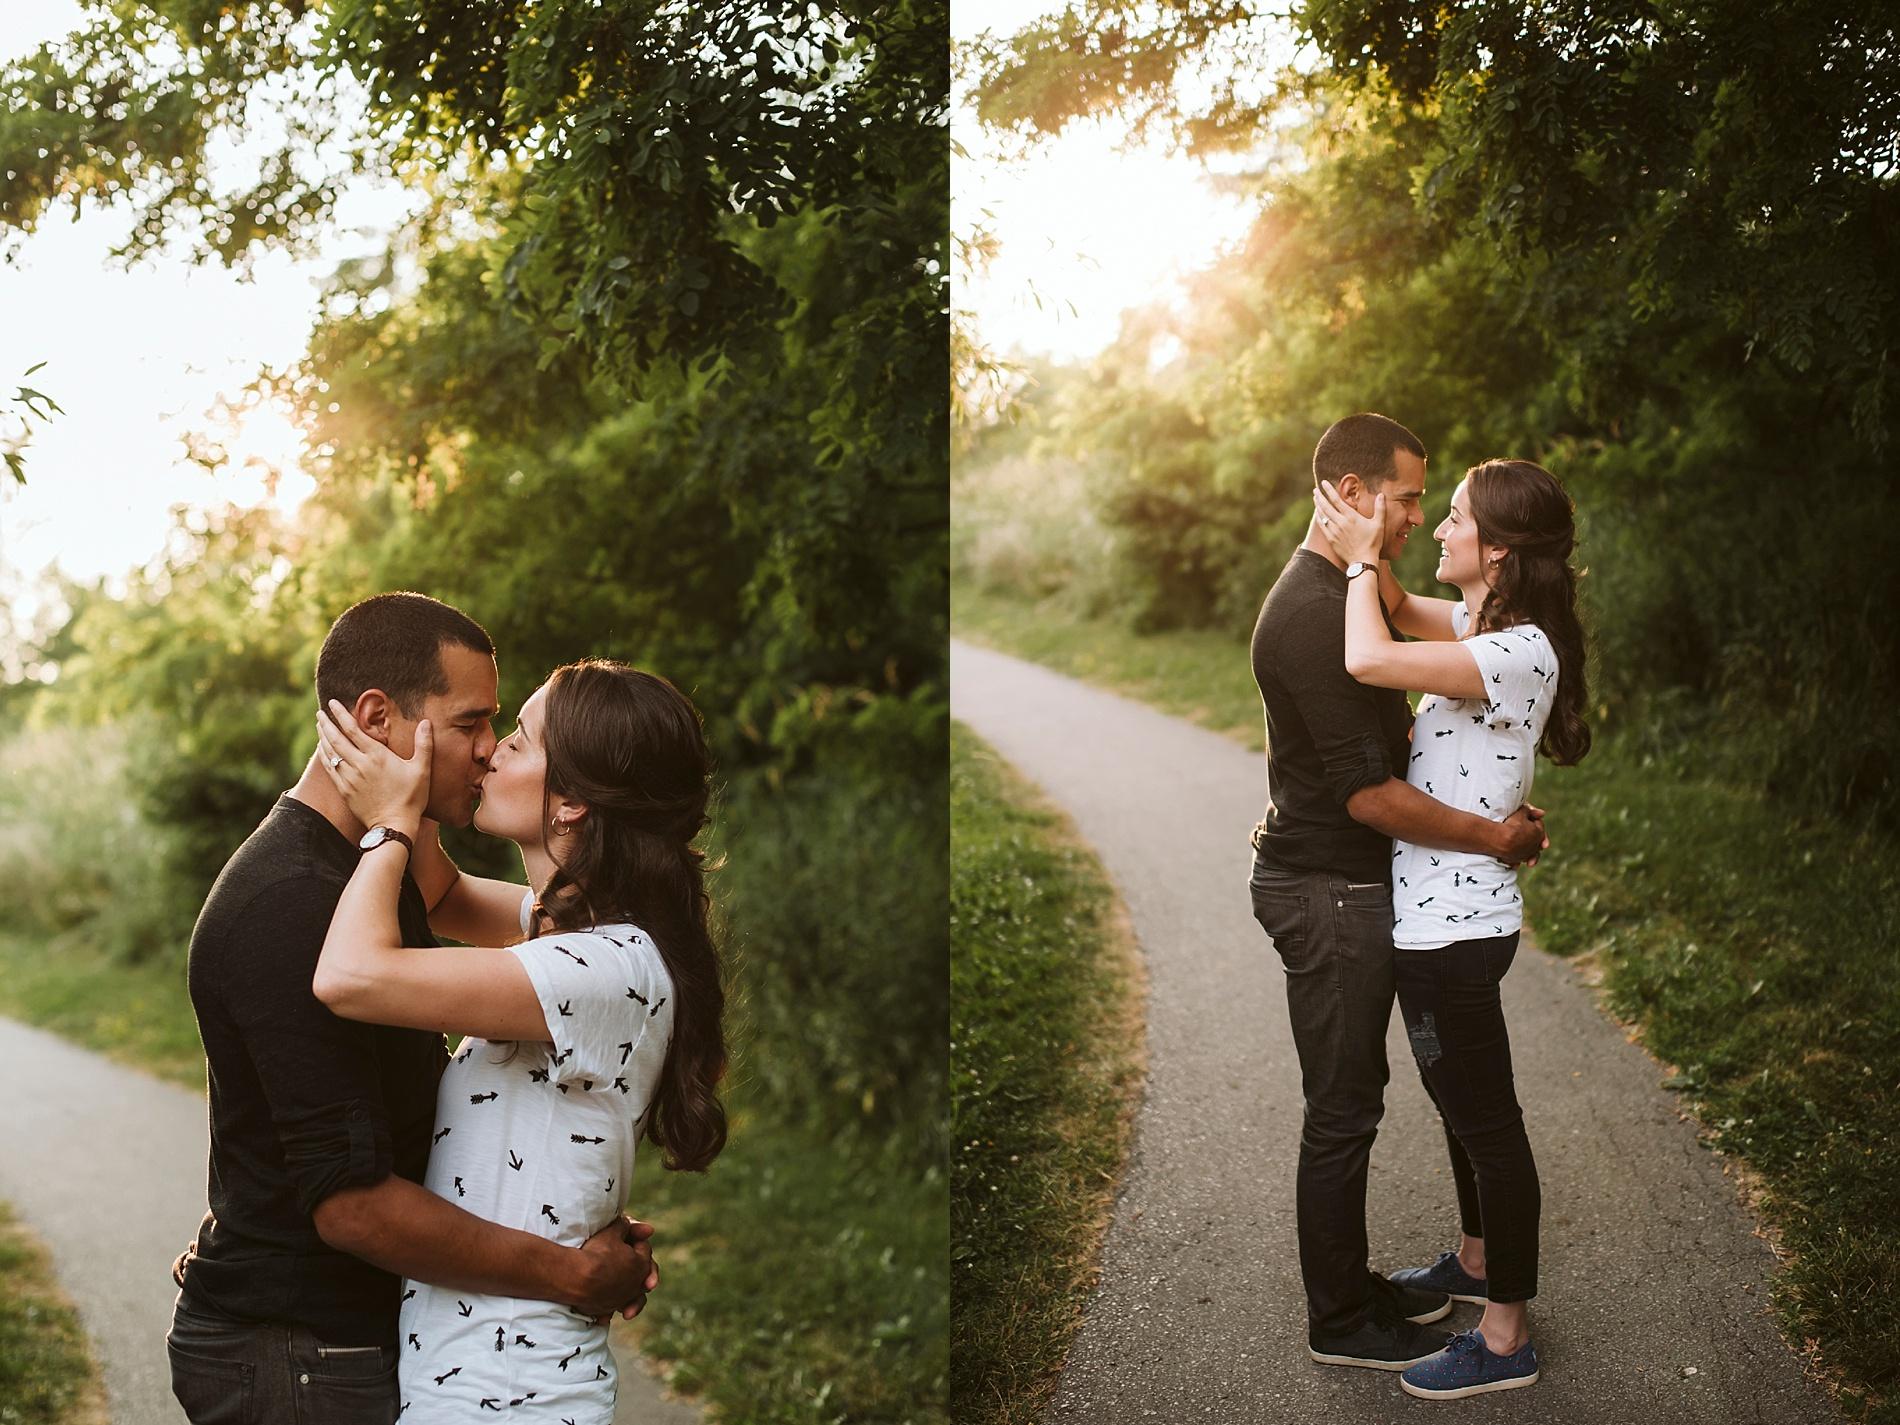 Richmond_Green_Engagement_shoot_Toronto_Wedding_Photographer07.jpg